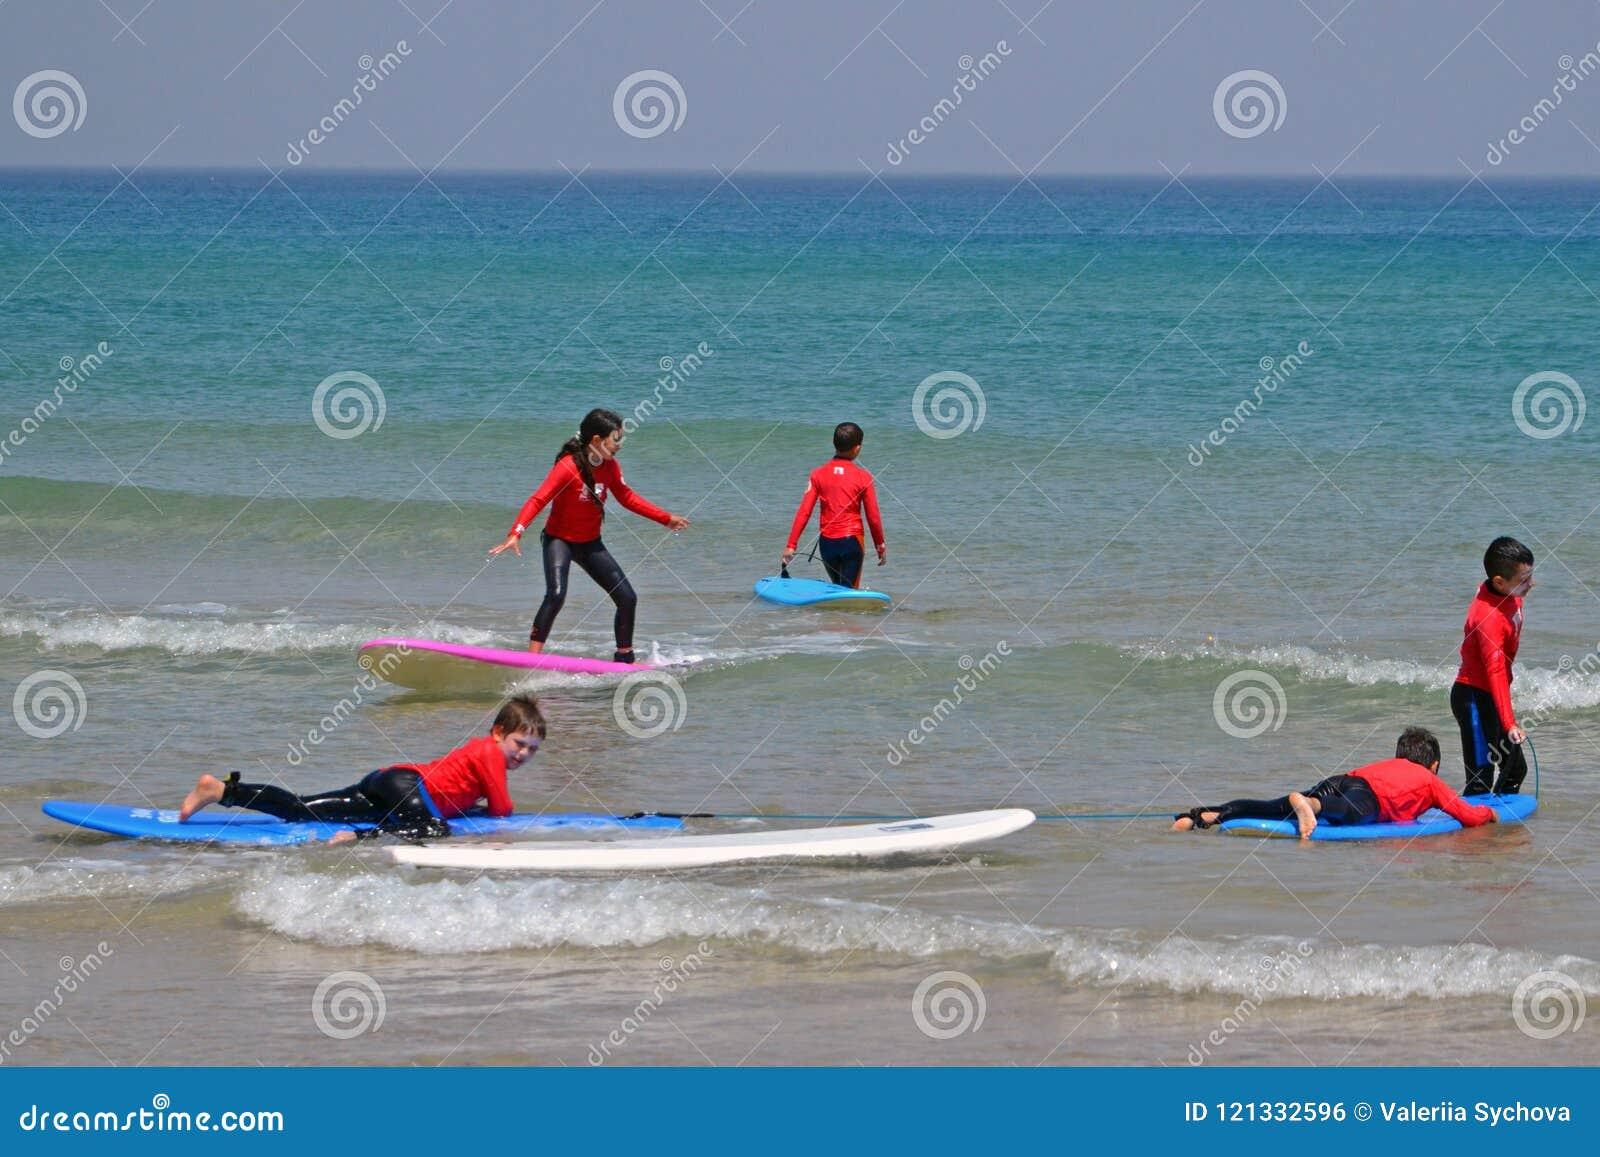 Tel Aviv Israel 04 05 2017 Children Catch A Wave